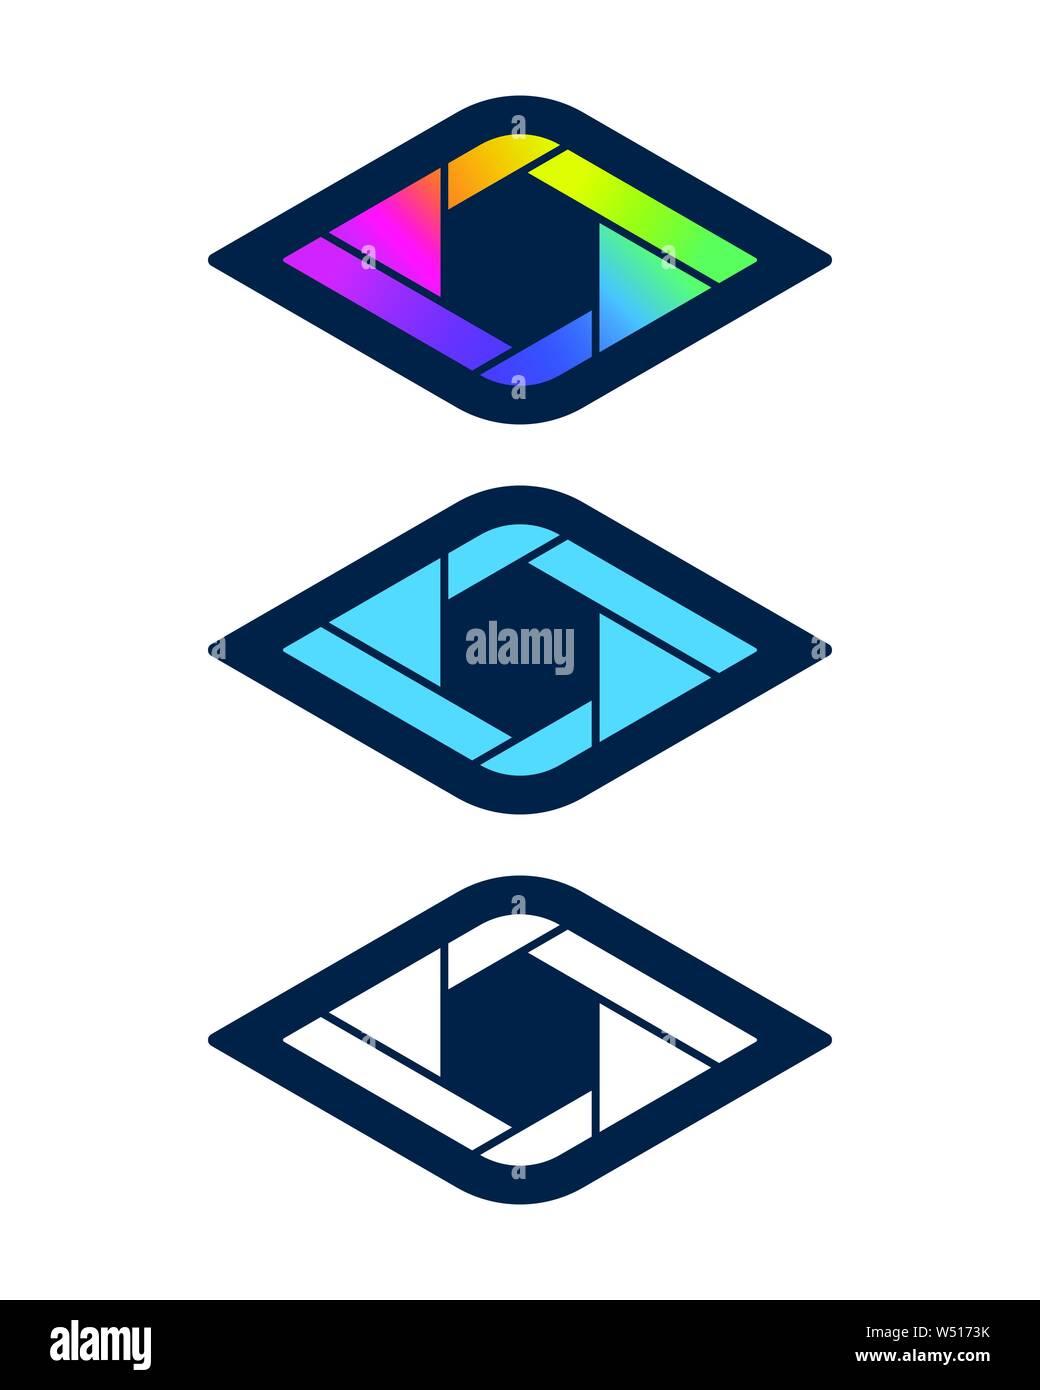 Diamond Shaped Shutter Symbols Vision And Media Icon Design